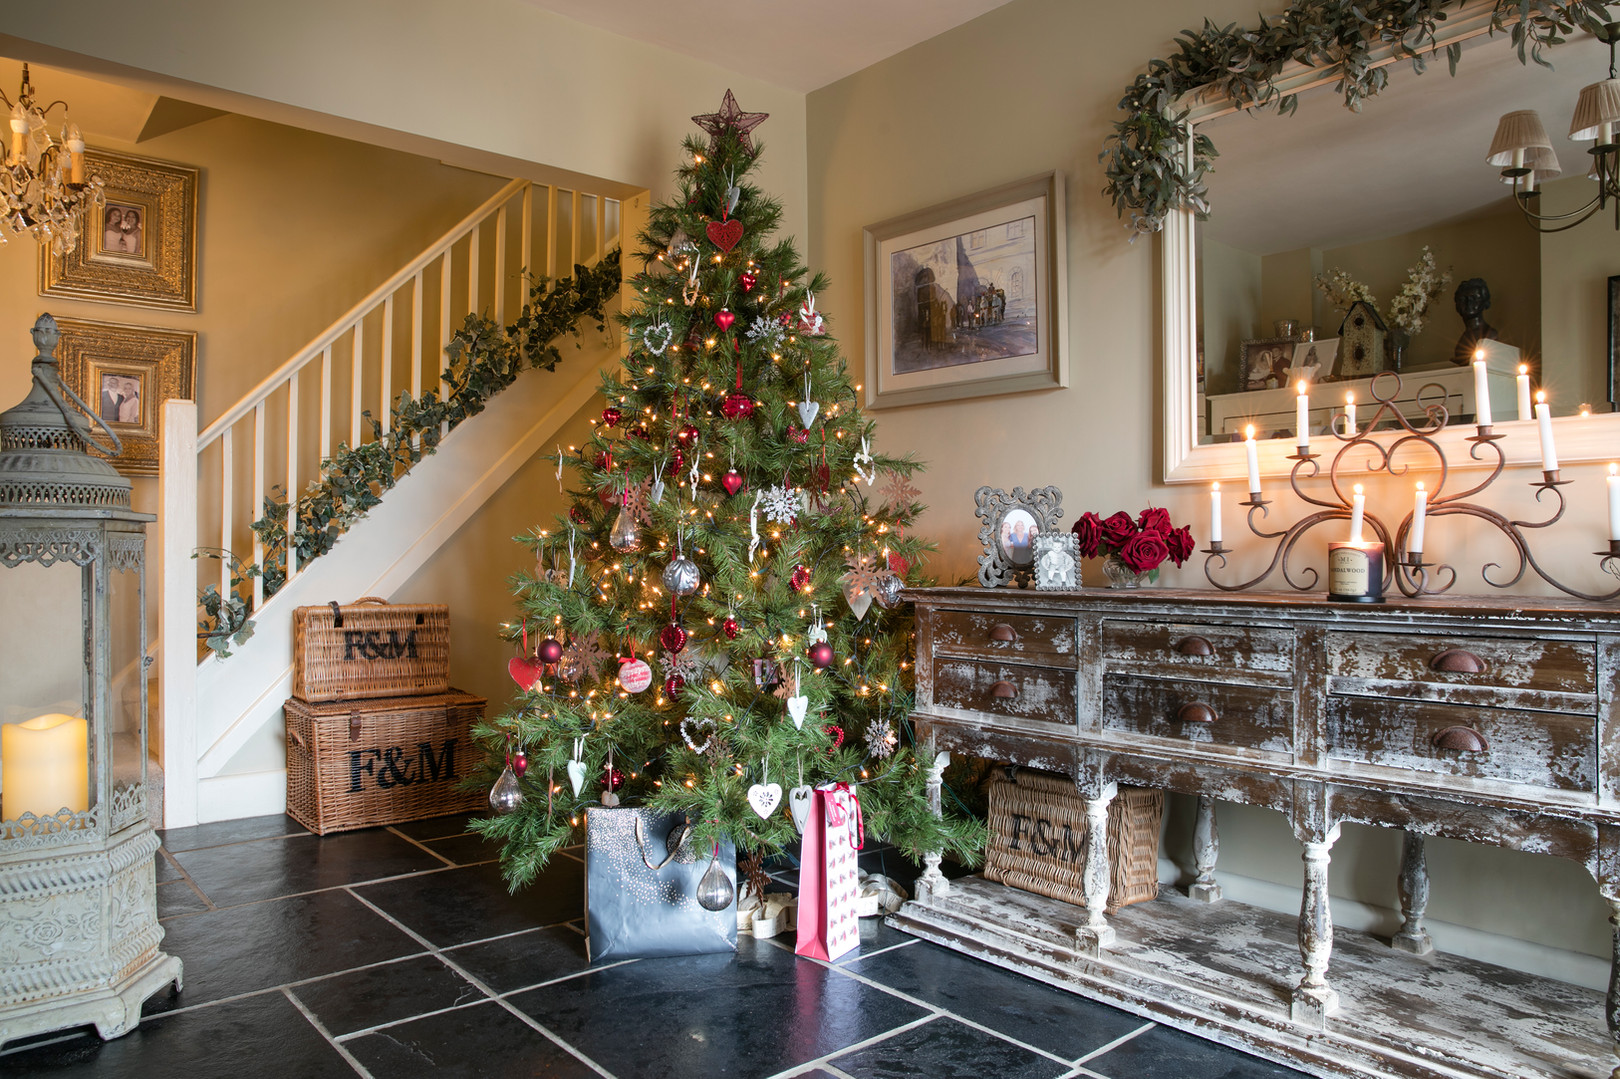 Hall at christmas interior design.jpg